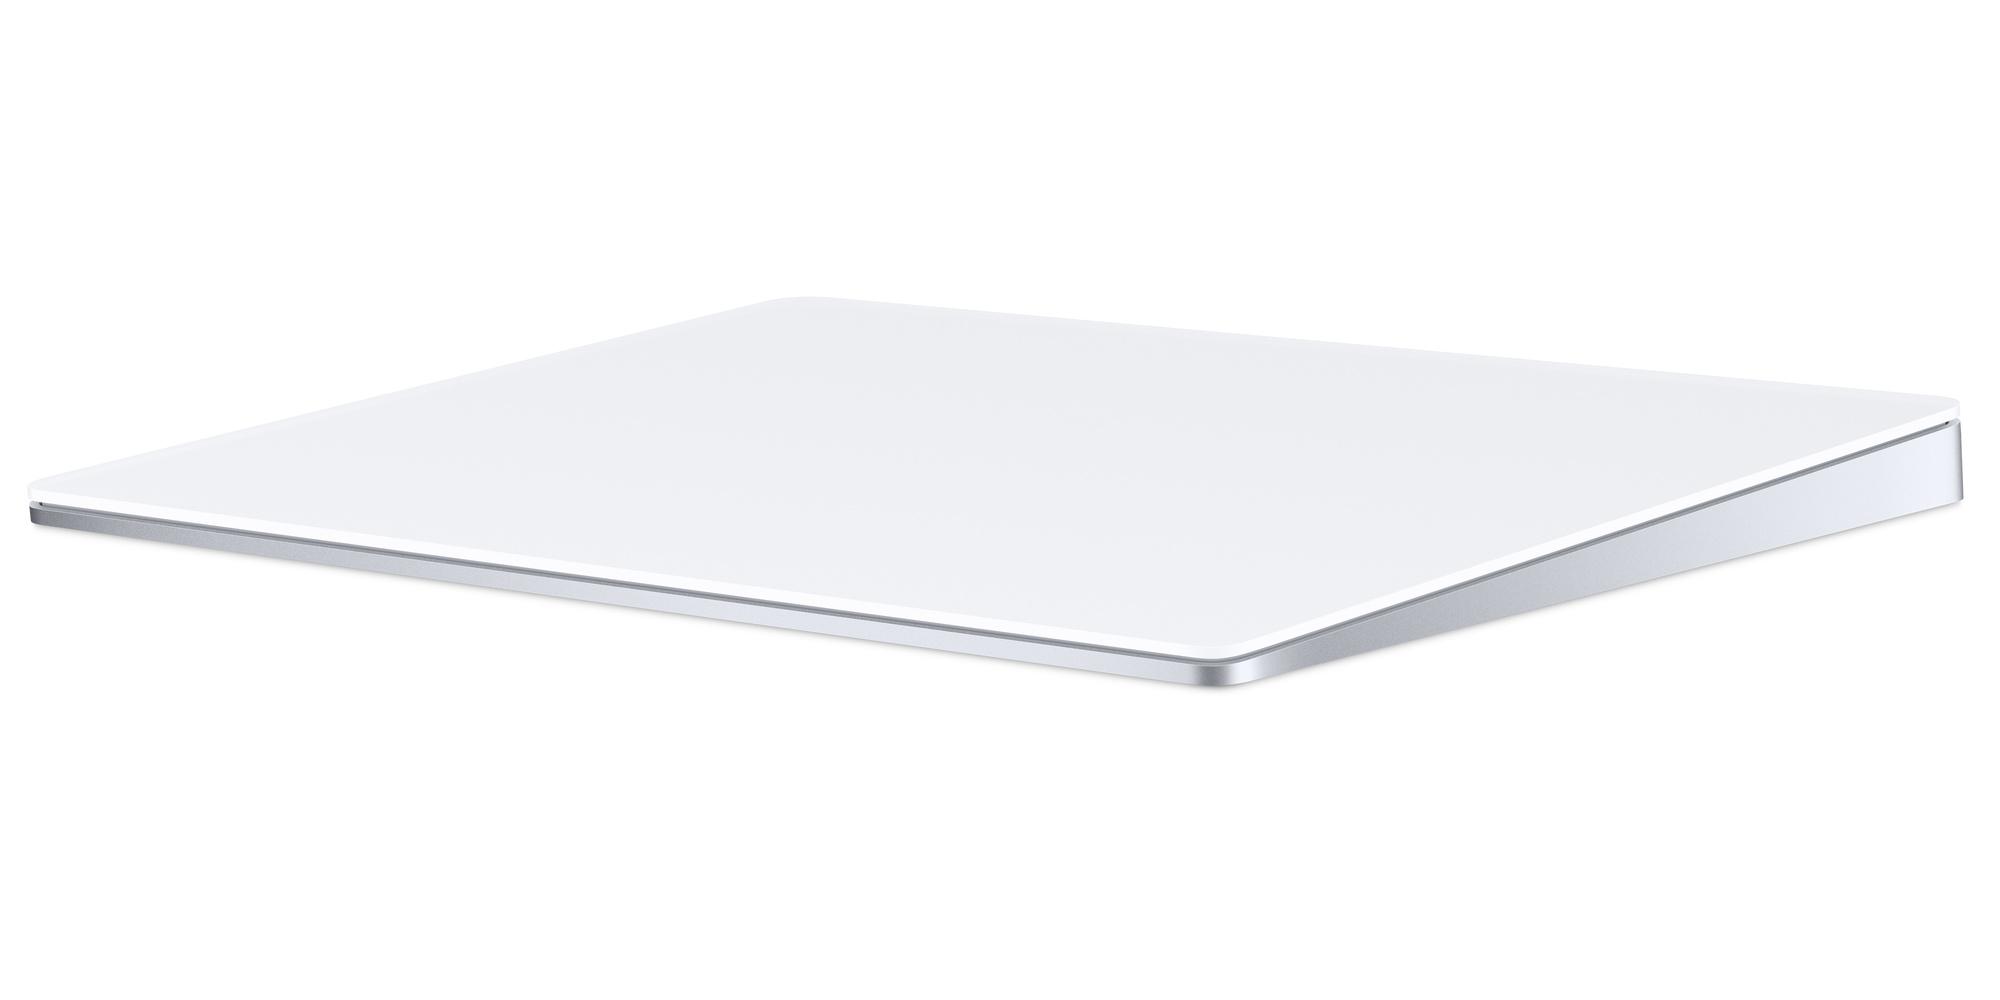 Magic Trackpad 2 ???sølv